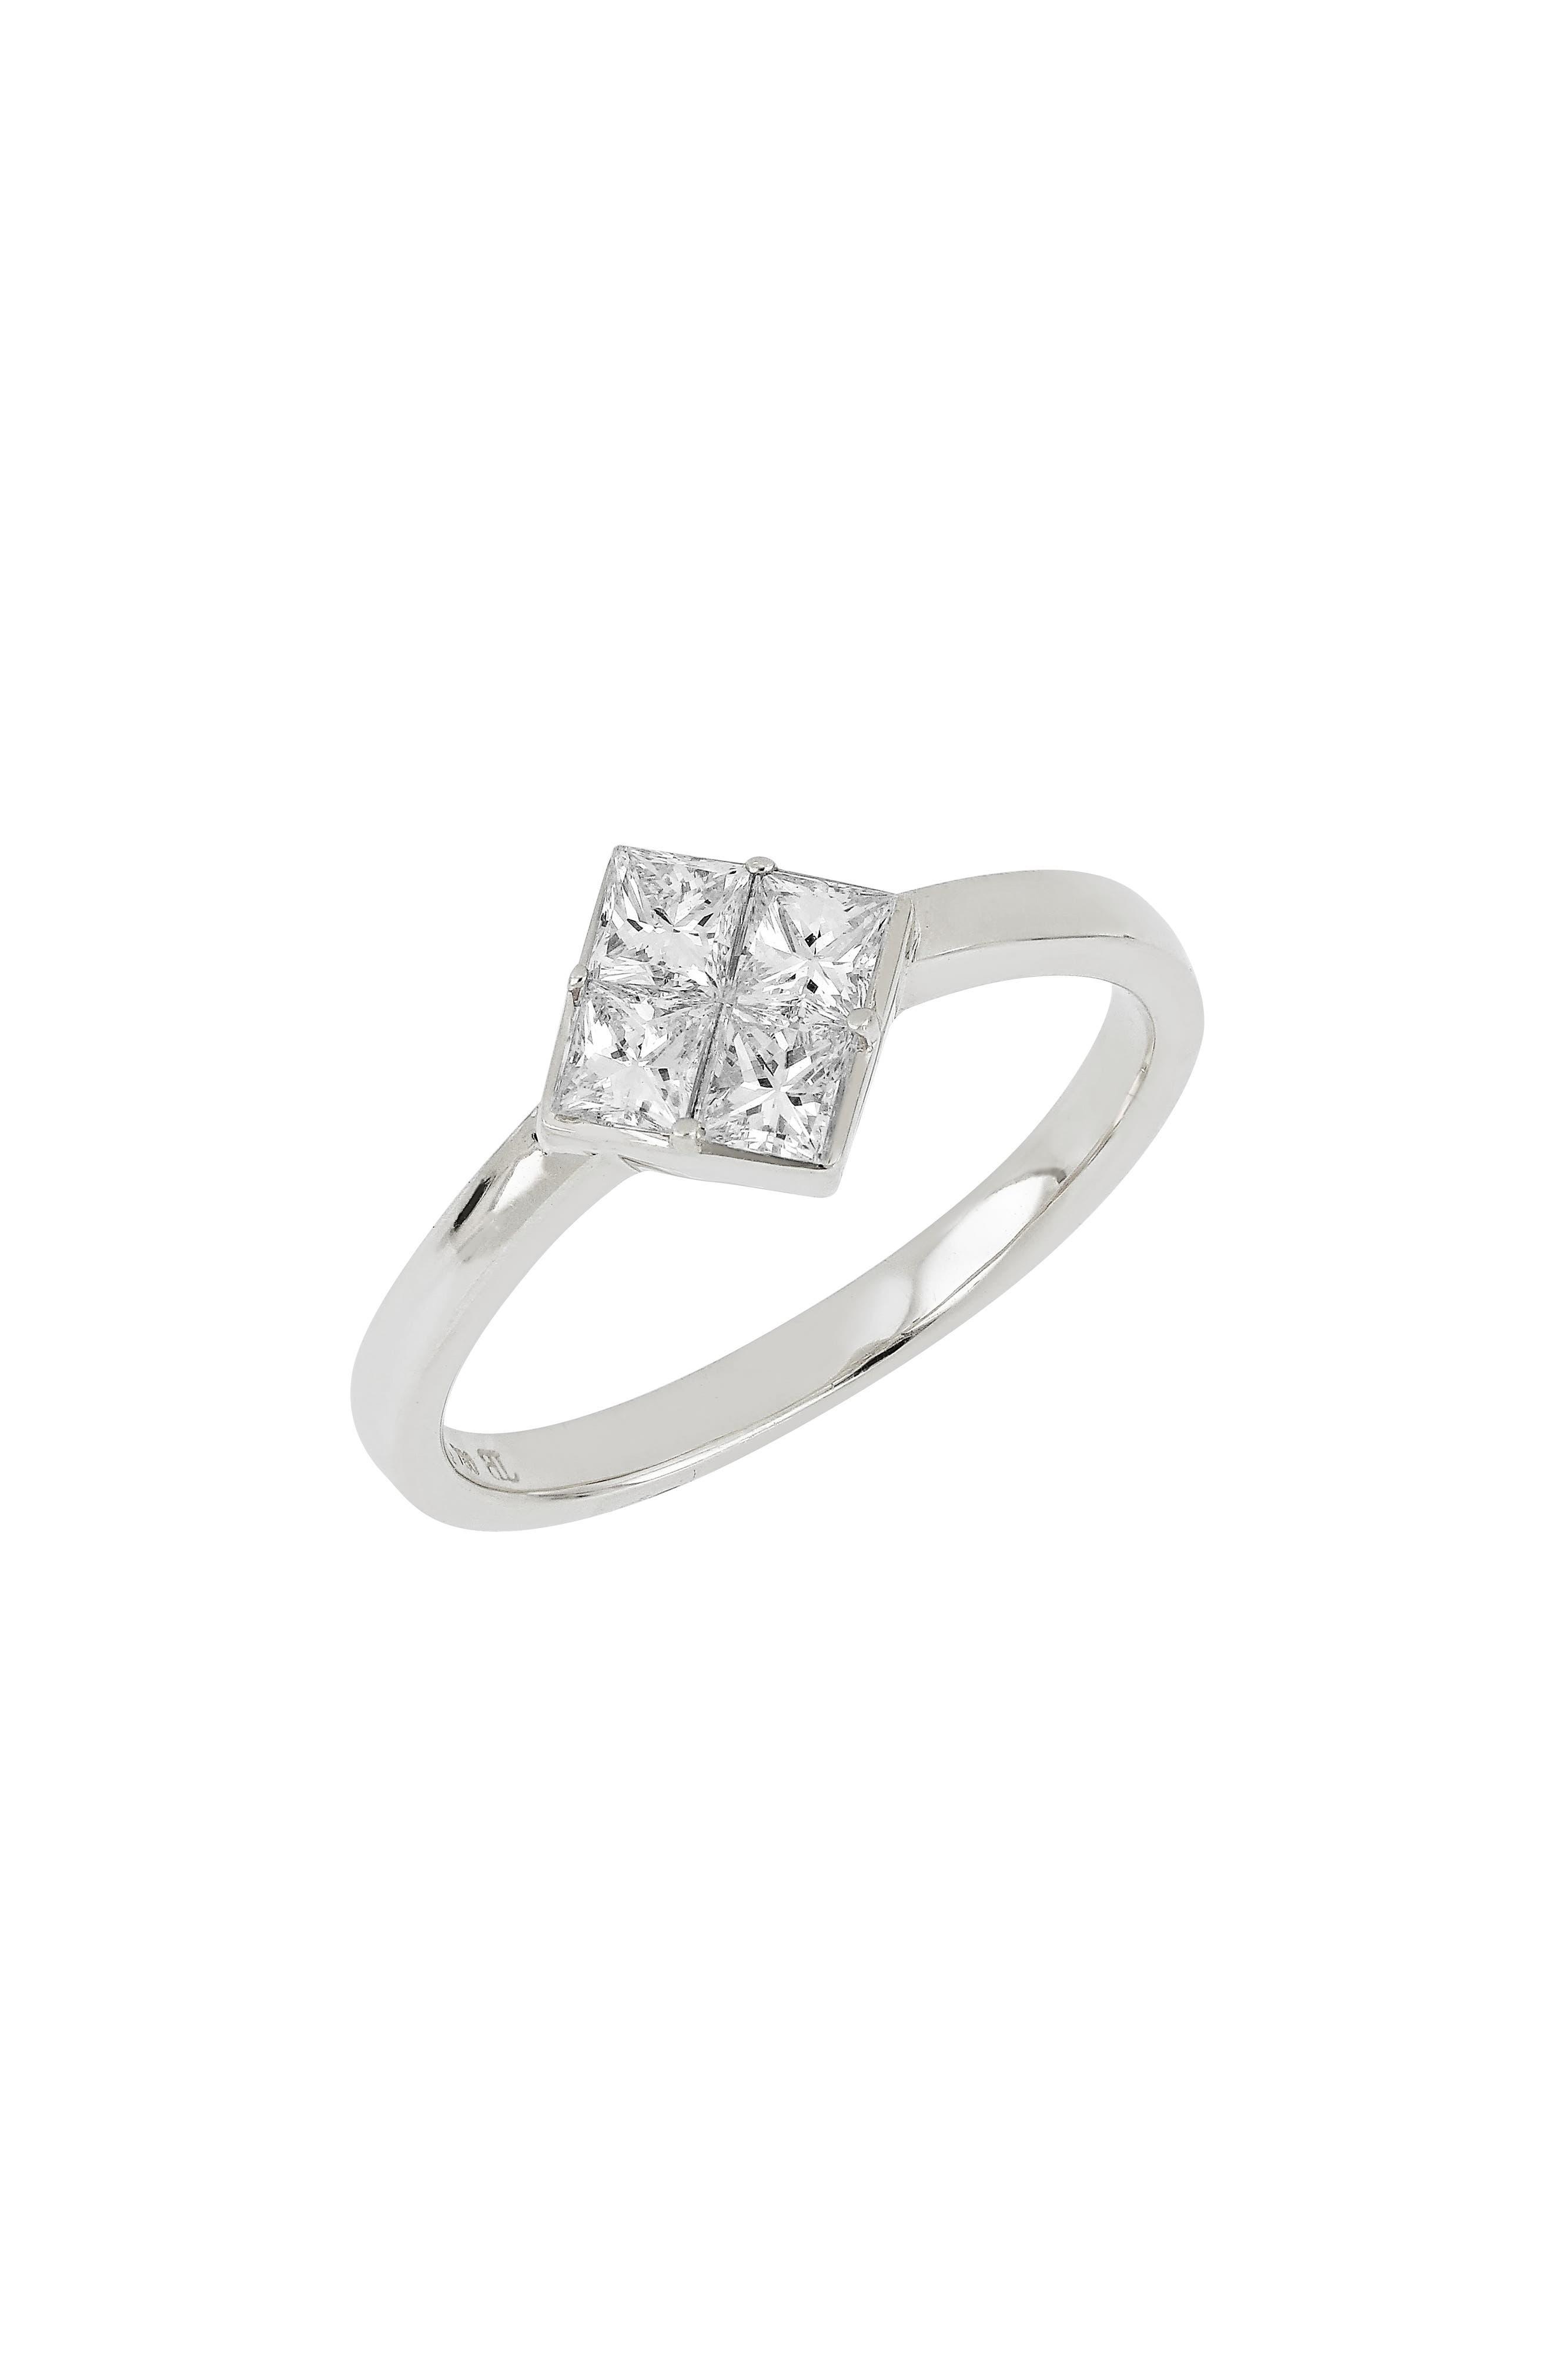 Diamond Cluster Ring,                         Main,                         color, WHITE GOLD/ DIA